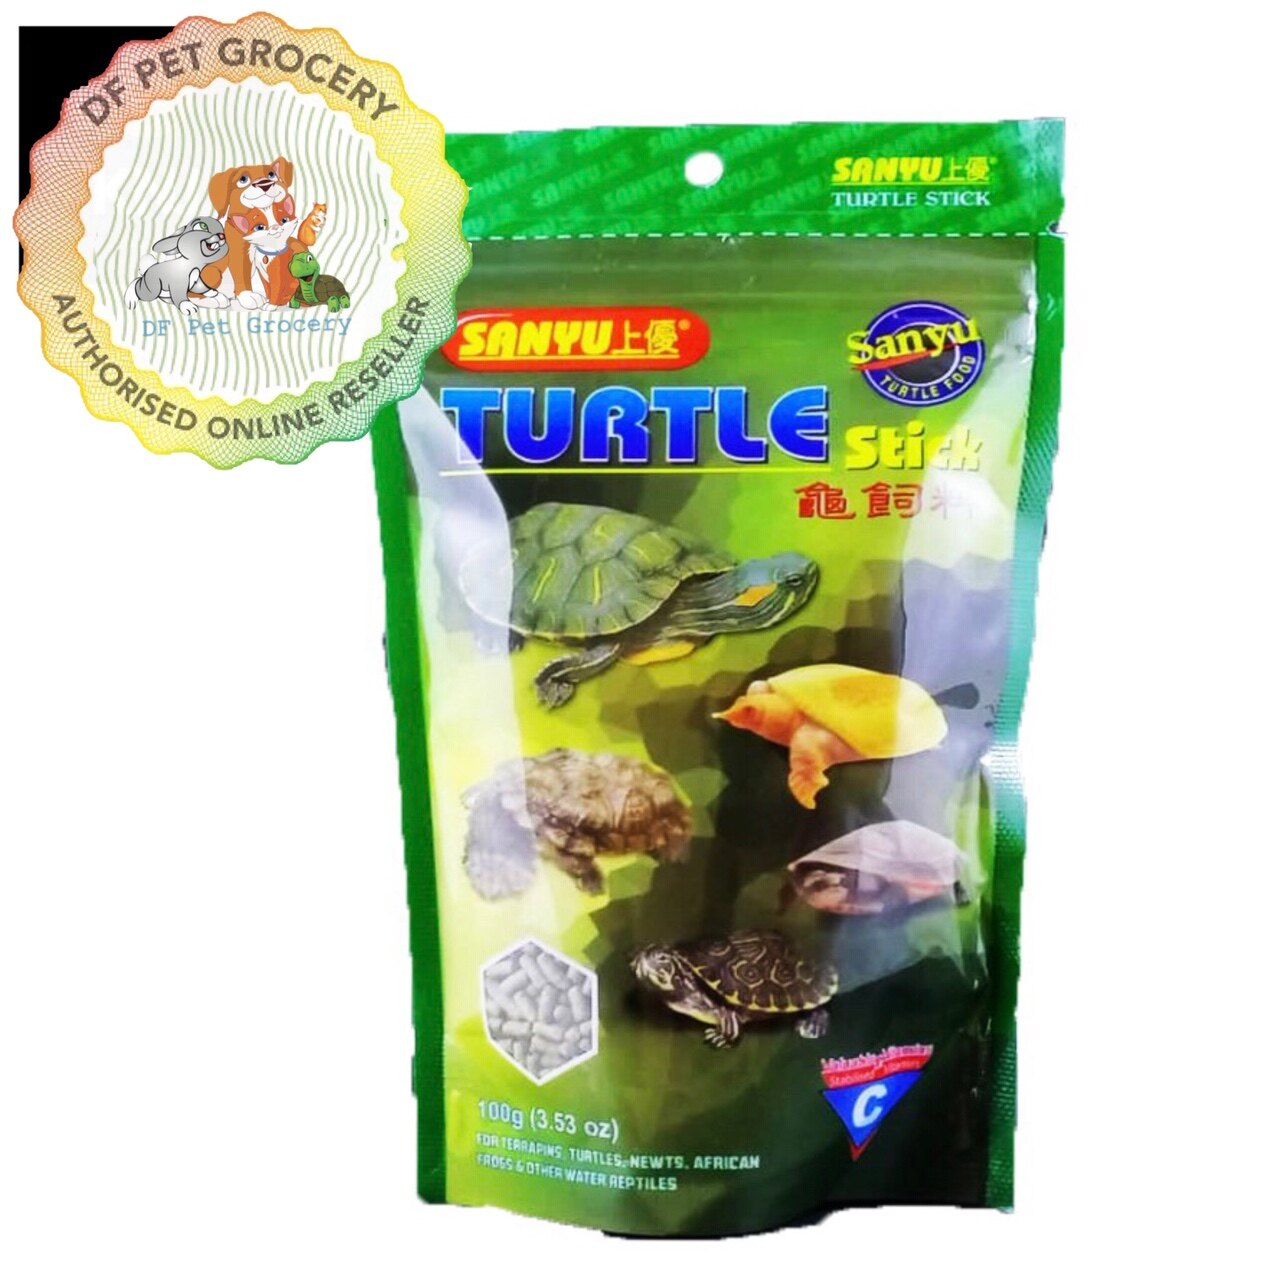 Sanyu Turtle stick 100g - Turtle Food - Makanan Kura - Kura dan Katak FF-746